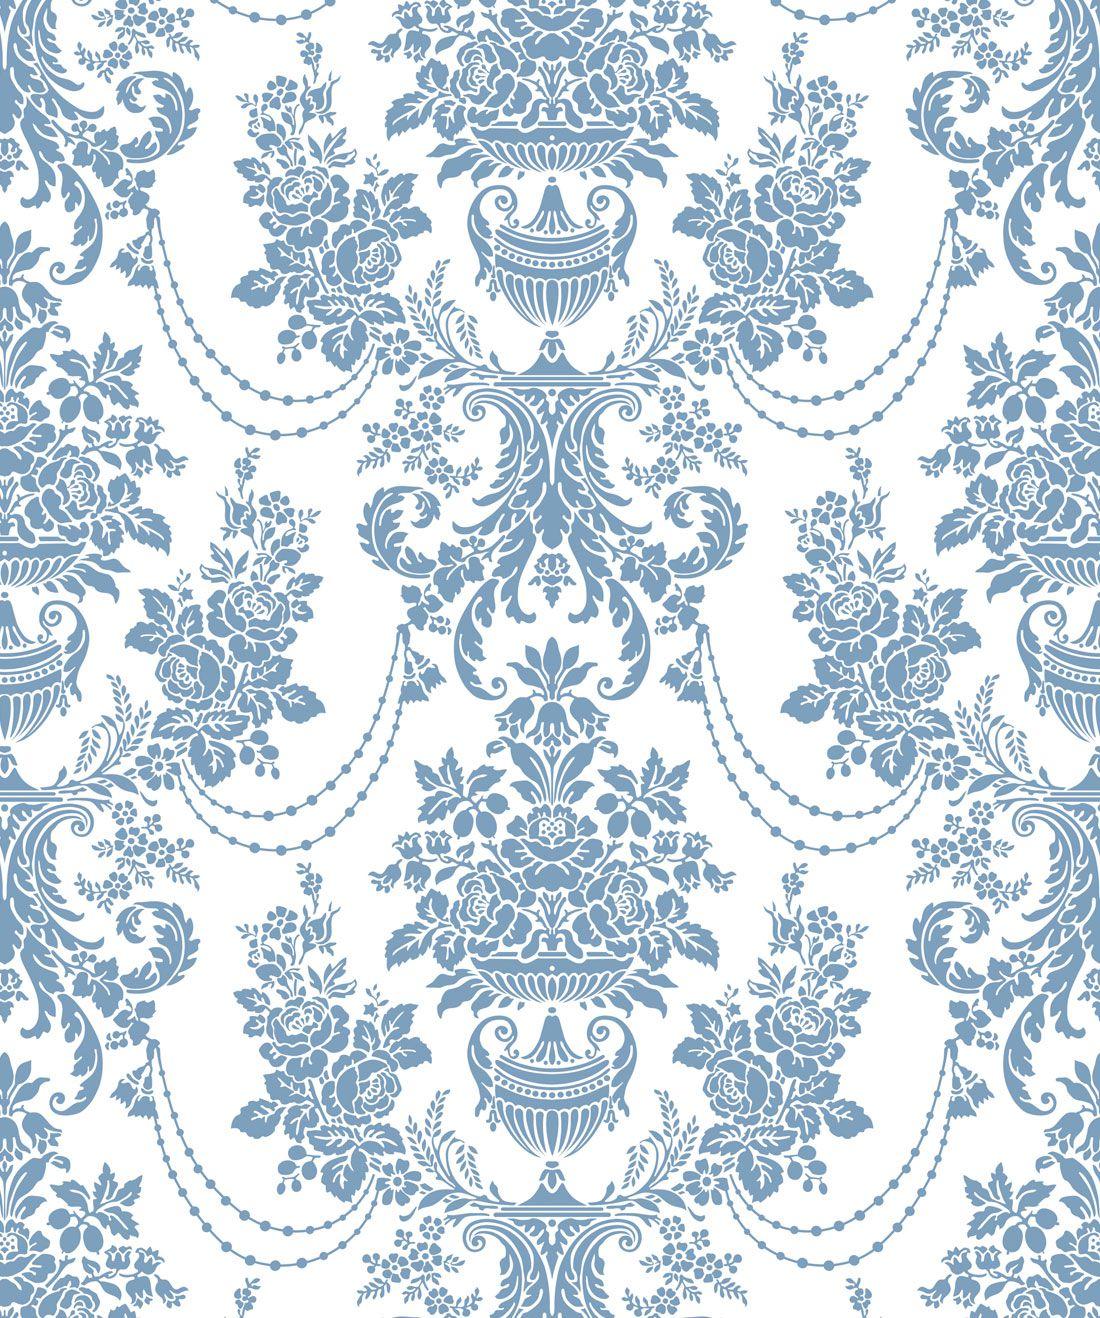 Imperial Wallpaper